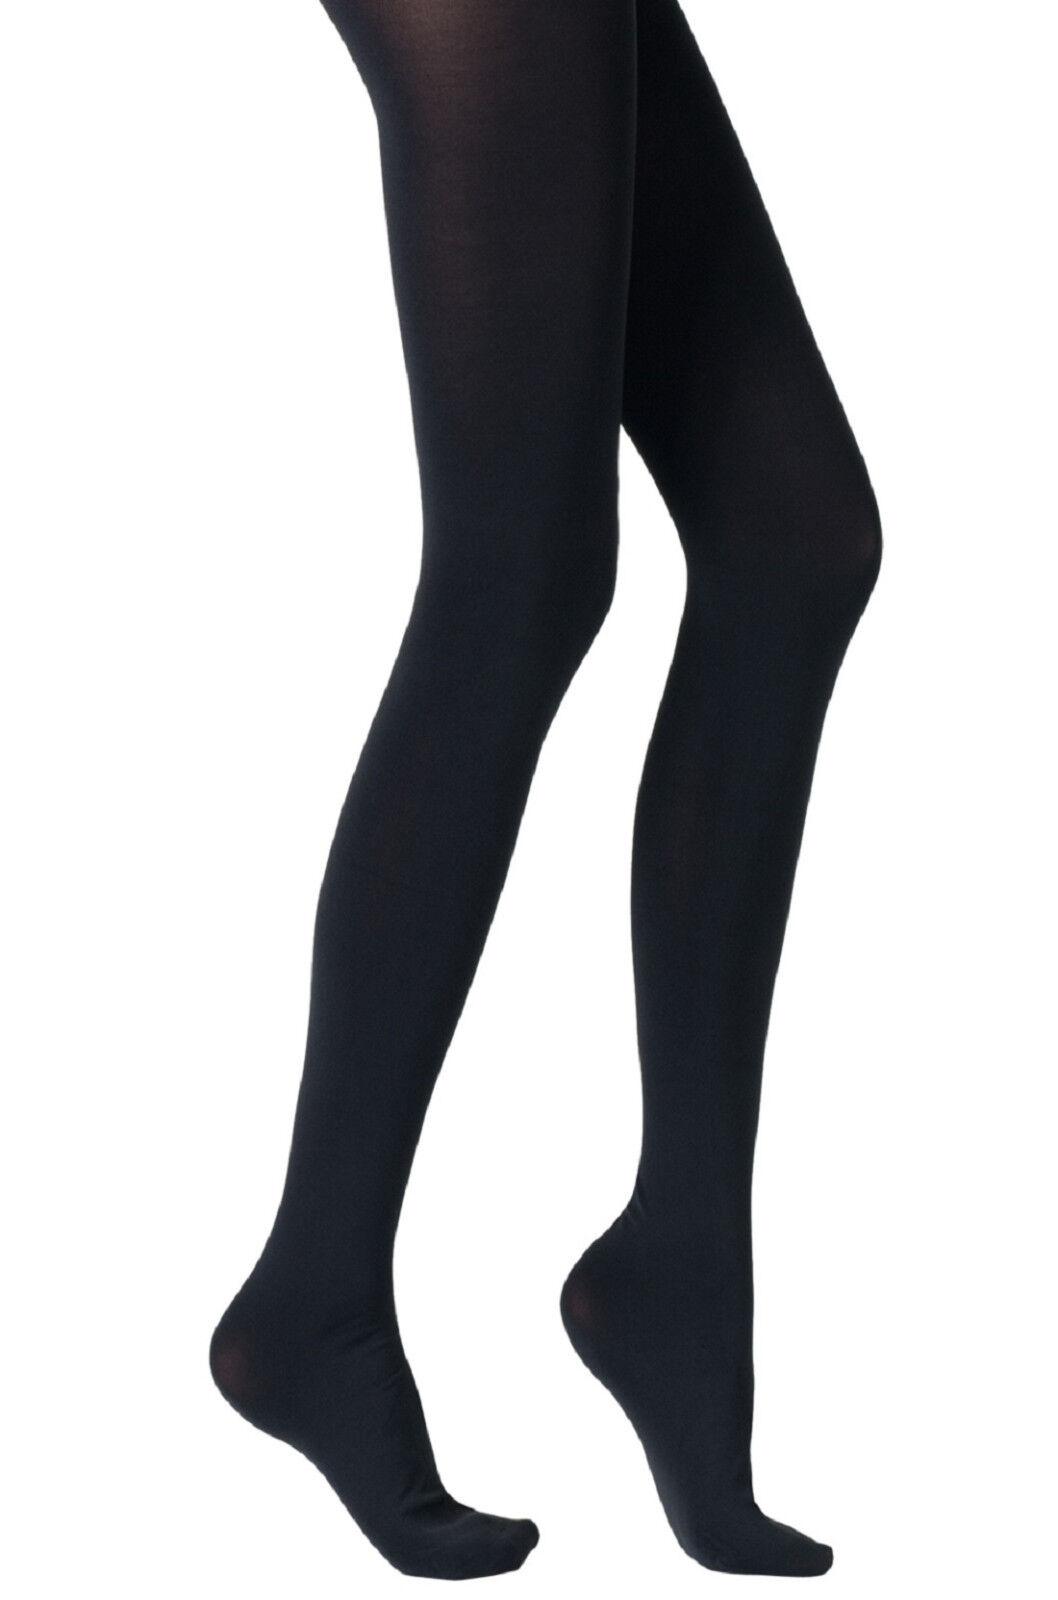 Fogal black Absolu 100 Denier Pantyhose - 570